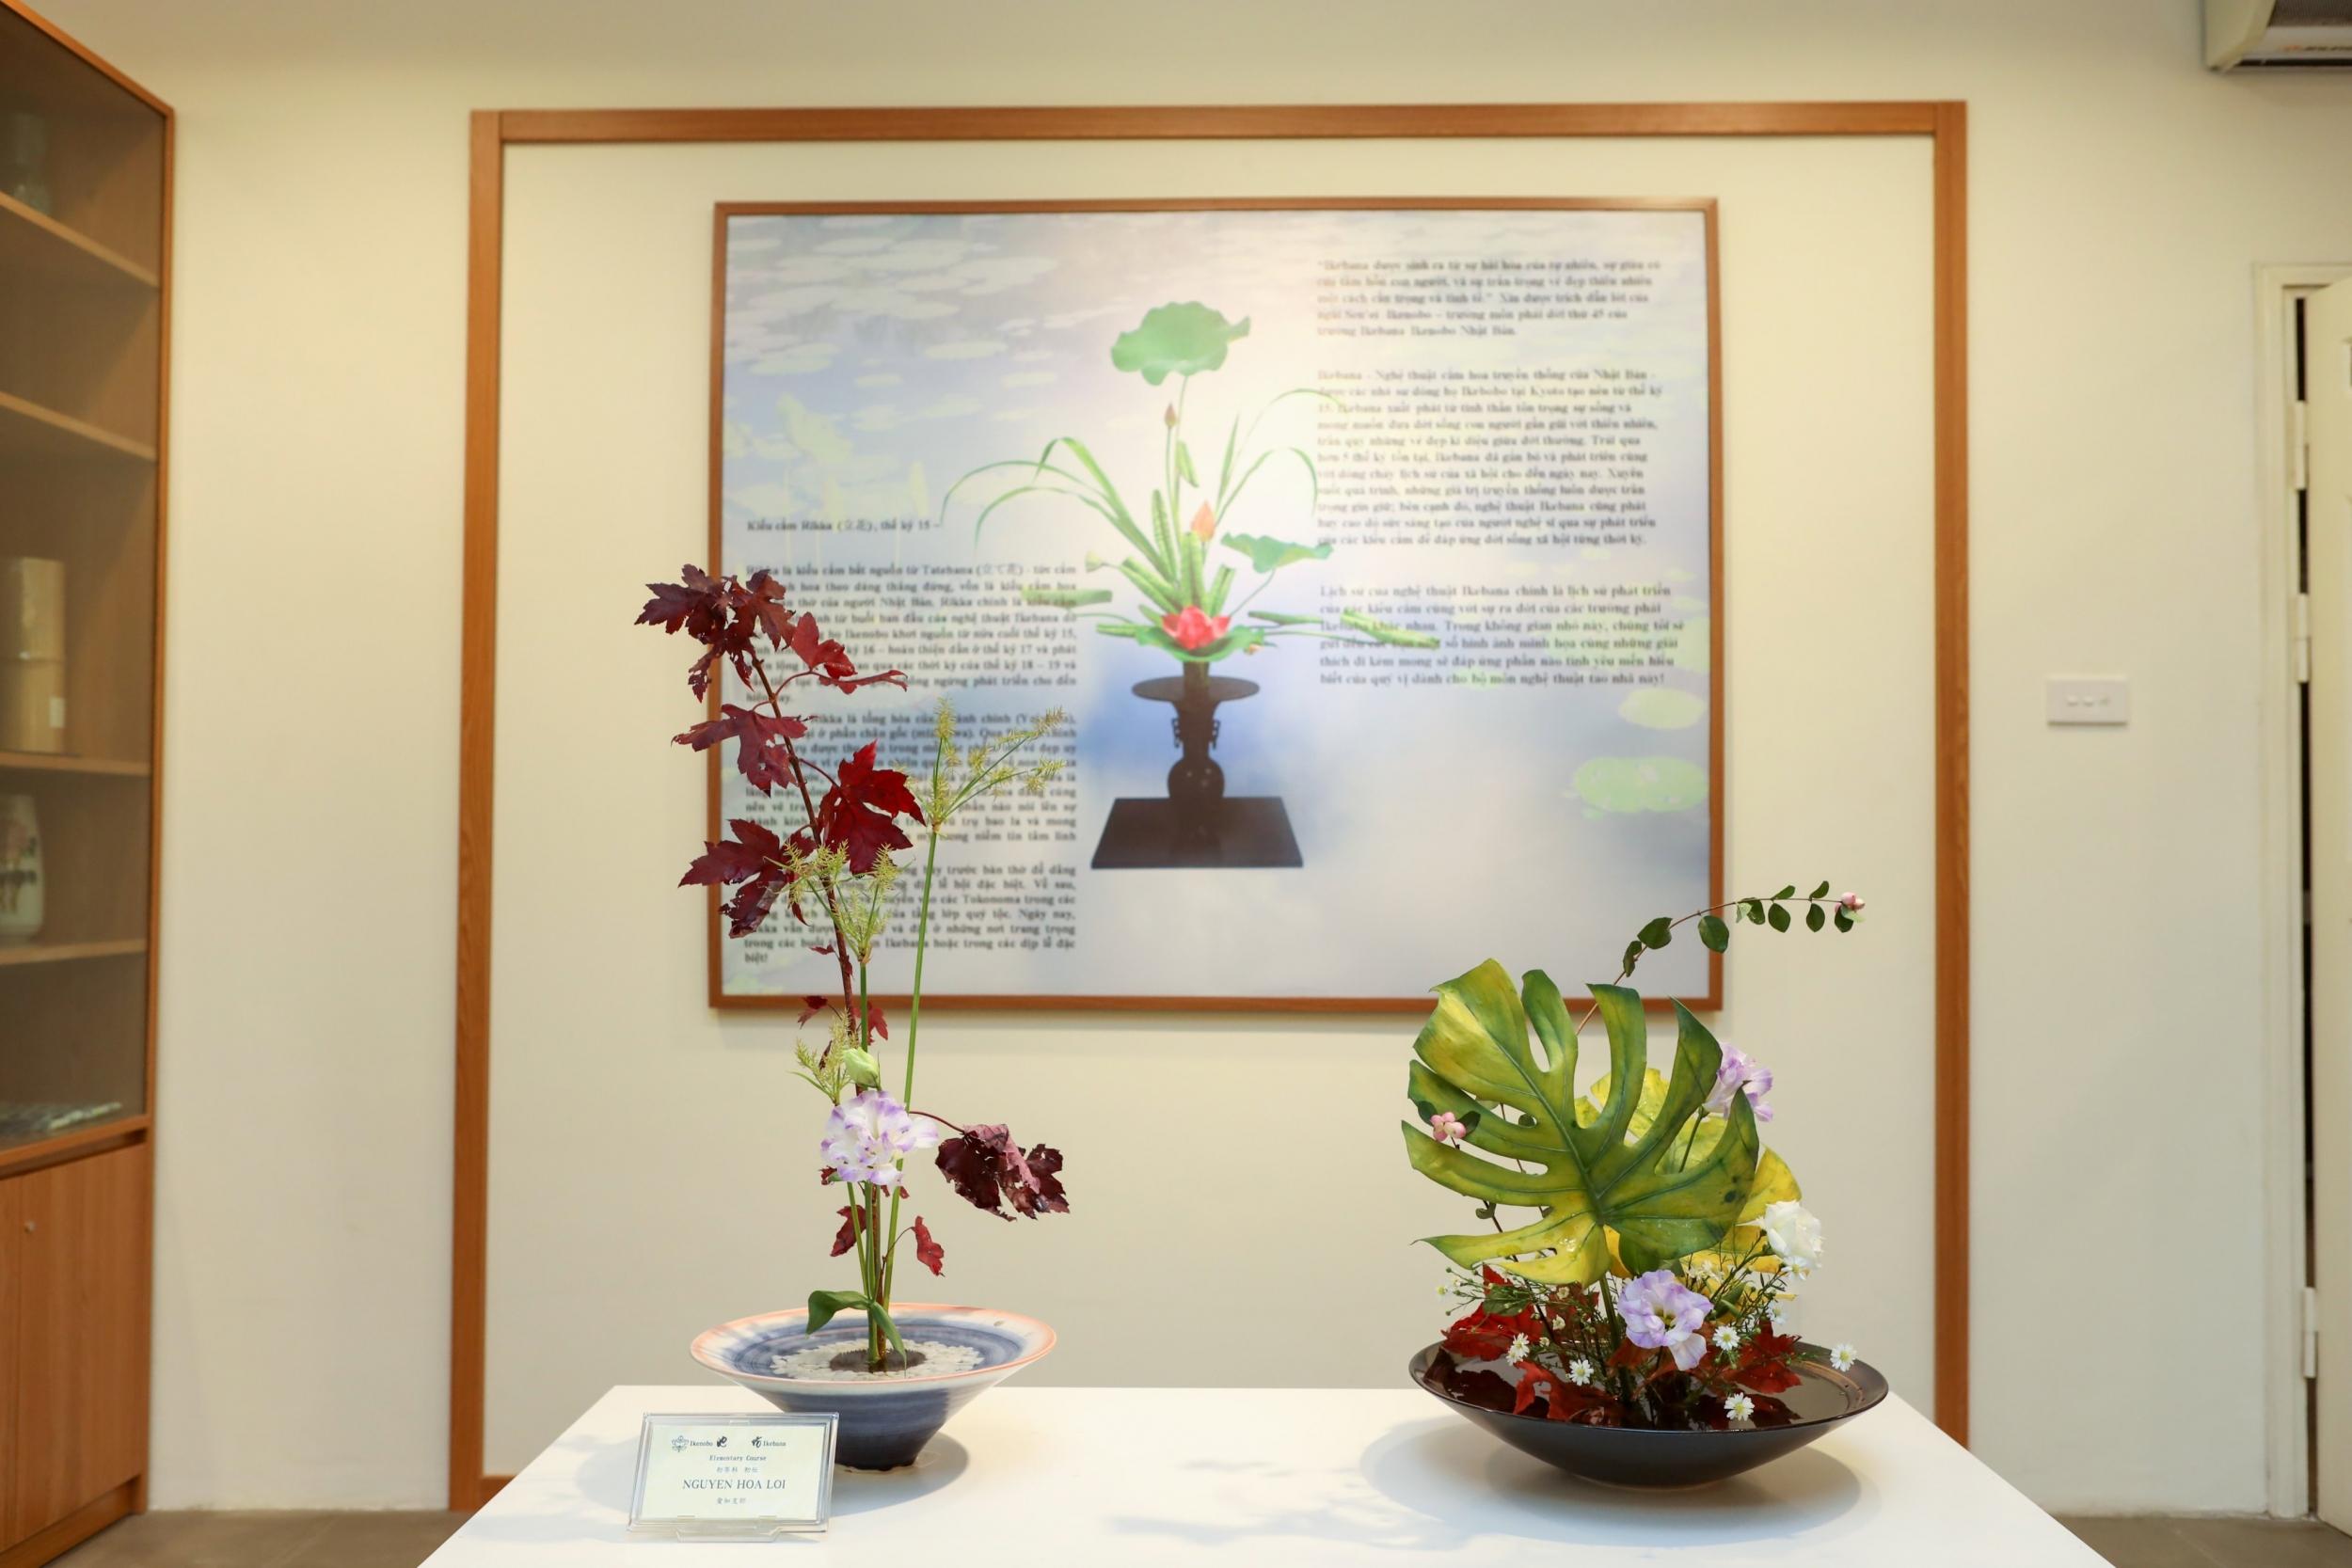 ra-mat-ikebana-house-khong-gian-nghe-thuat-ikebana-dau-tien-tai-viet-nam-2